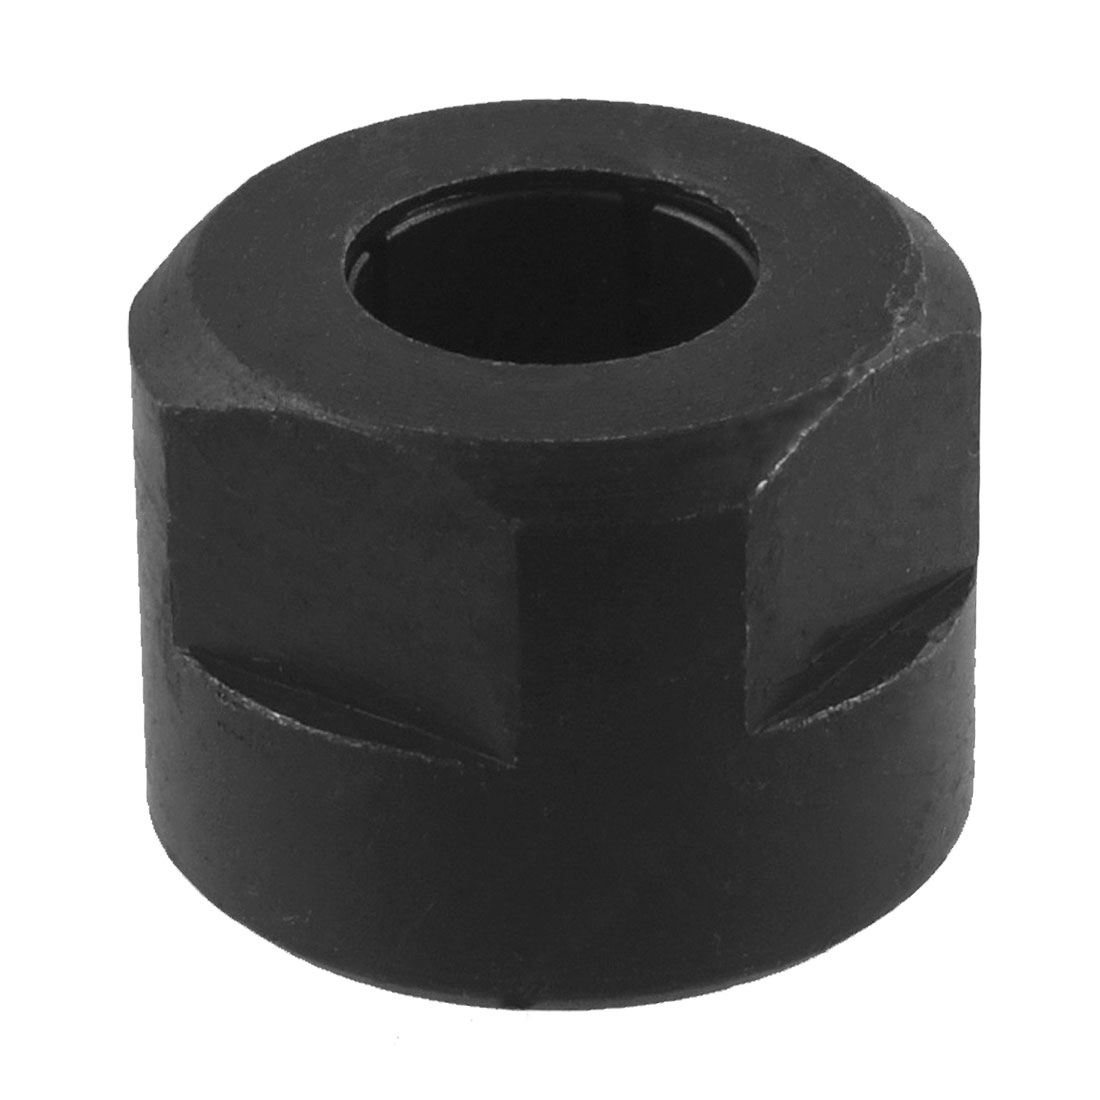 Power Tool Part Metal Collet Nut for Makita 3612 Engraving Machine